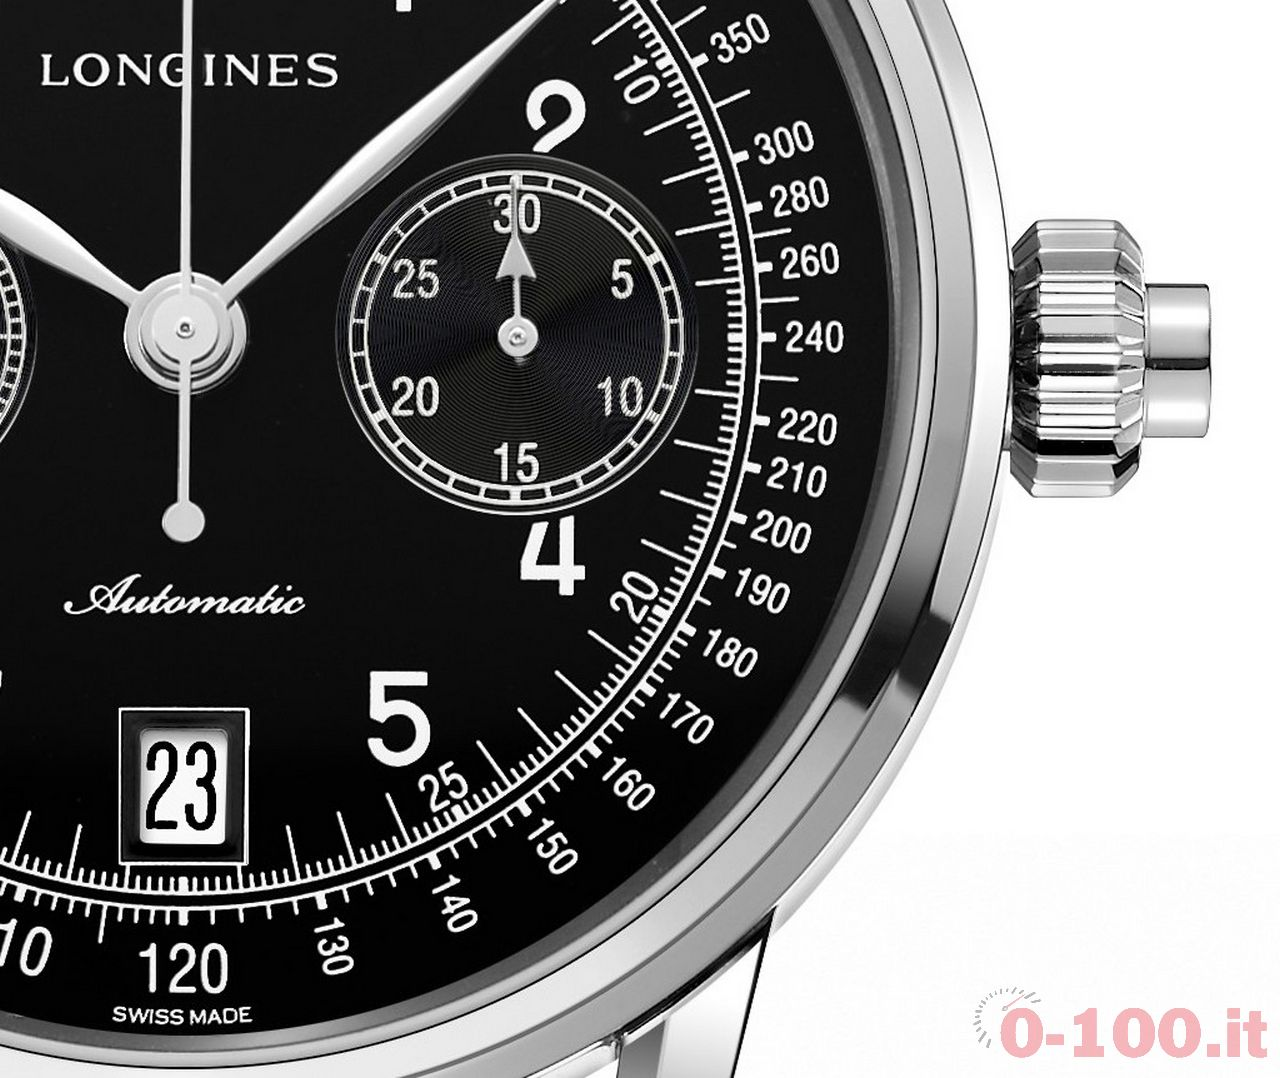 longines-column-wheel-single-push-piece-chronograph-price_0-1002